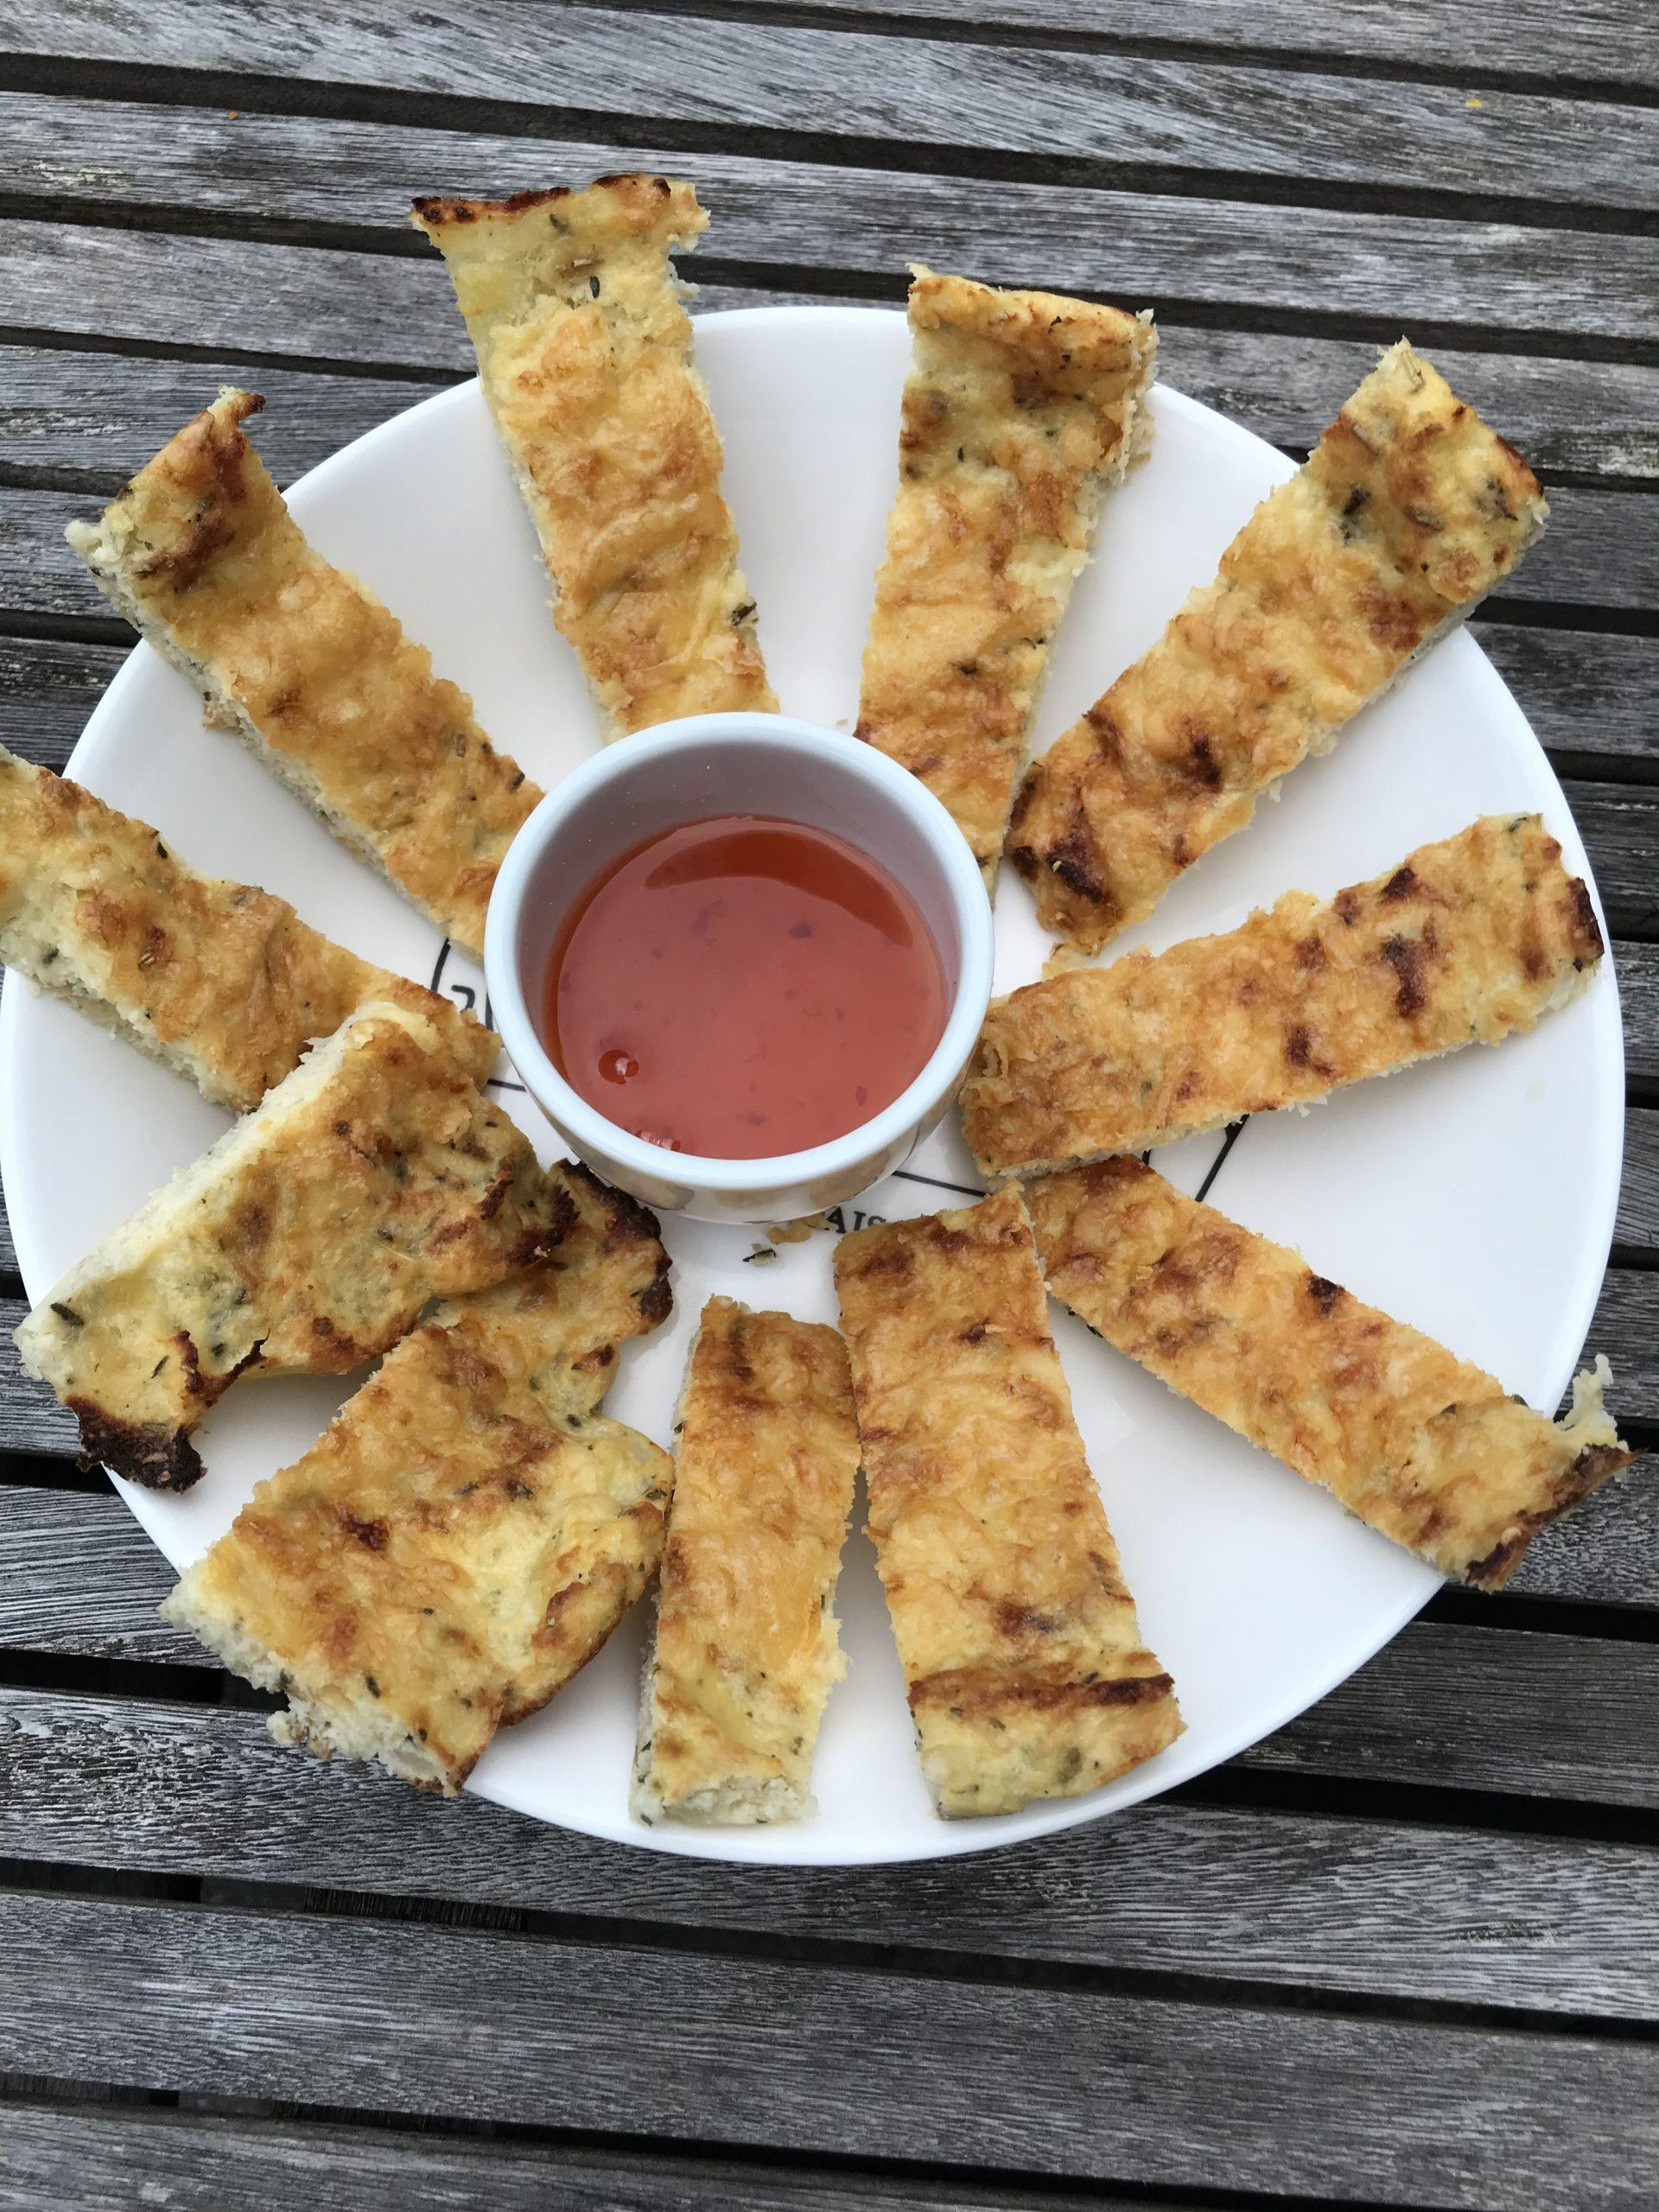 Bloemkool breadsticks